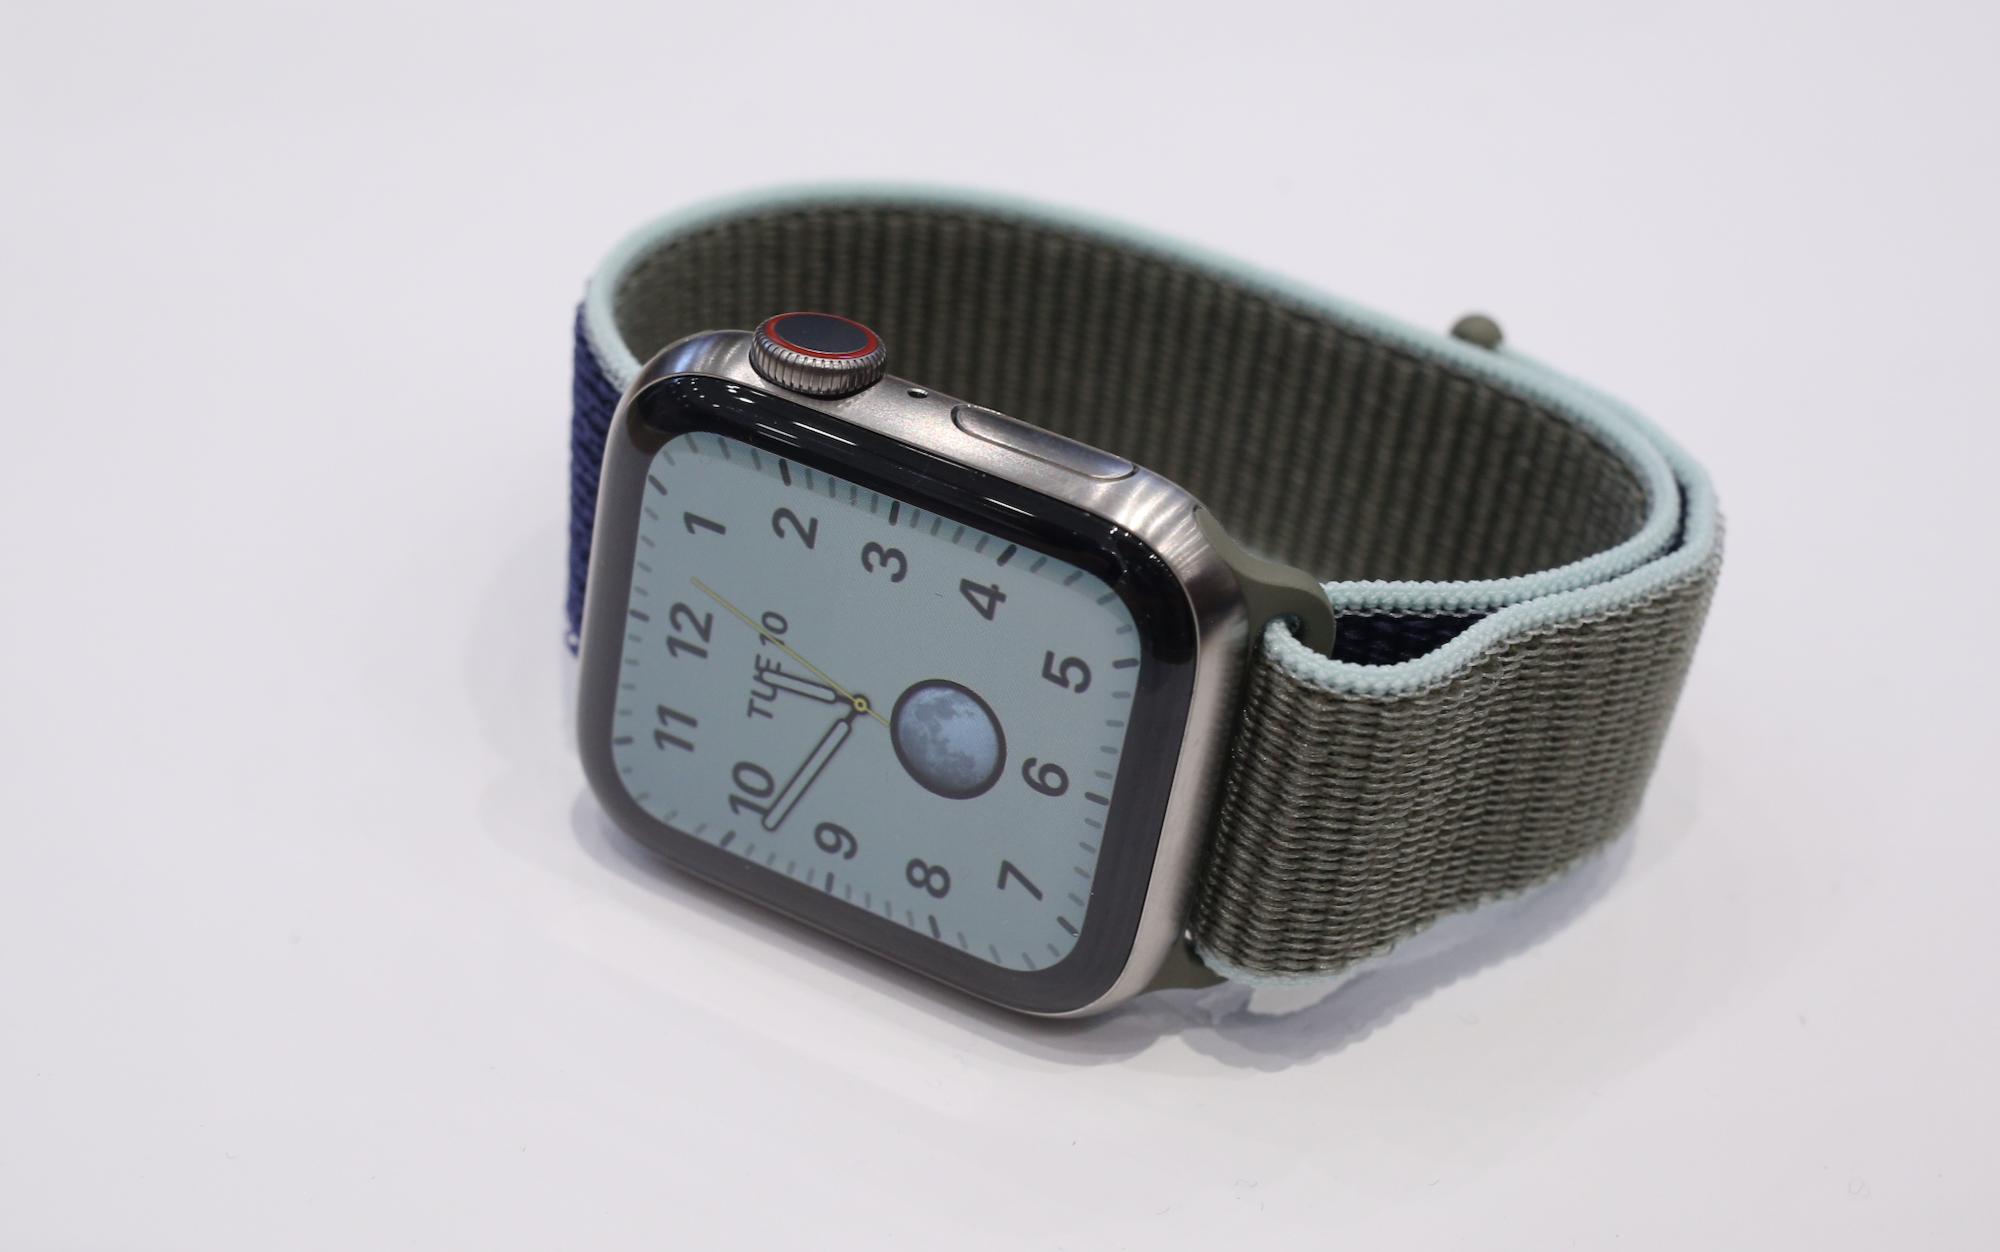 Apple Watch Series 5 hands-on | TechCrunch